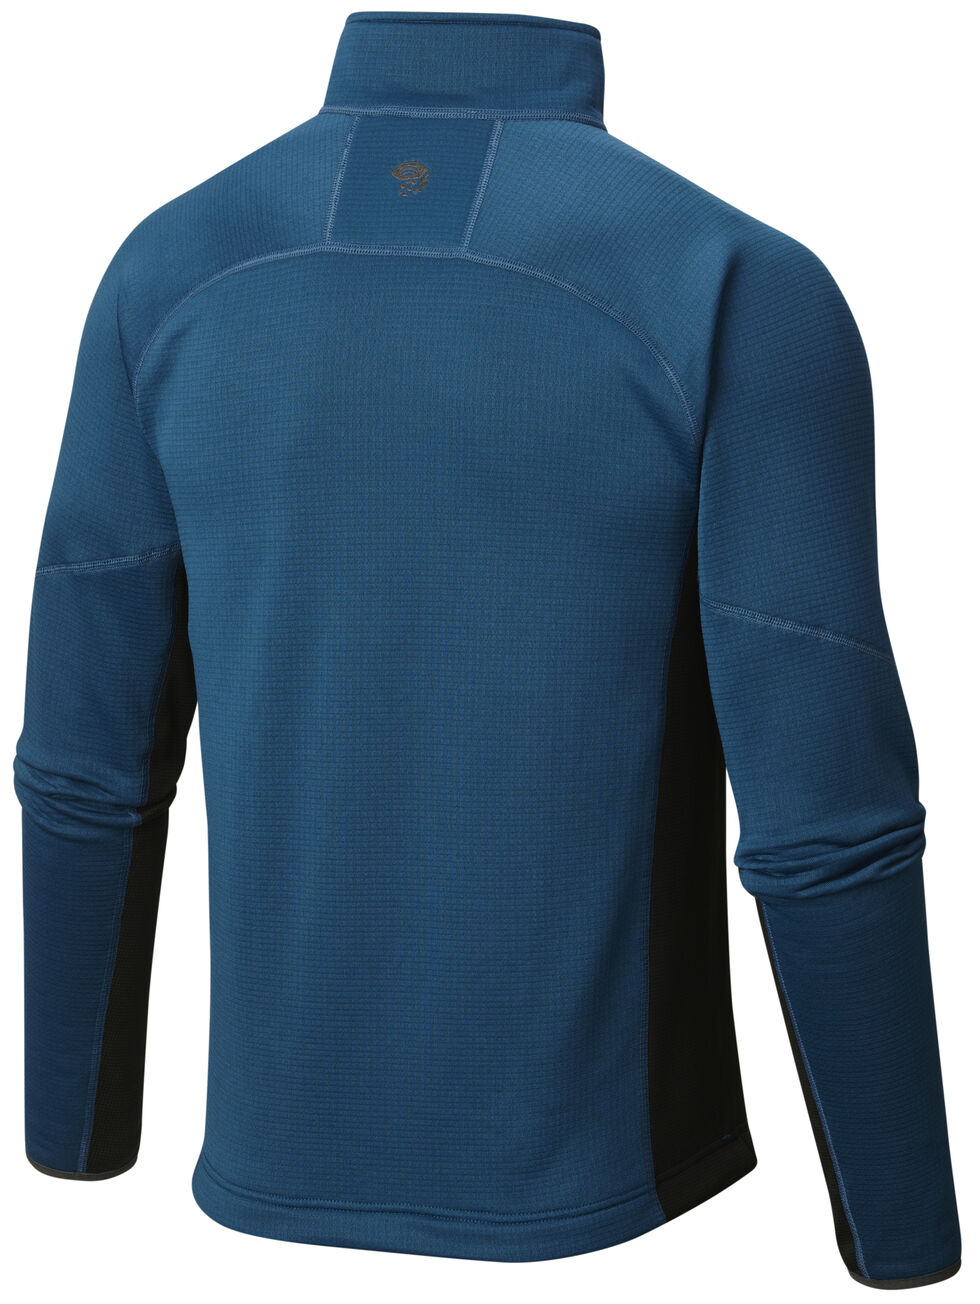 Mountain Hardwear Desna Grid Jacket, Blue, hi-res